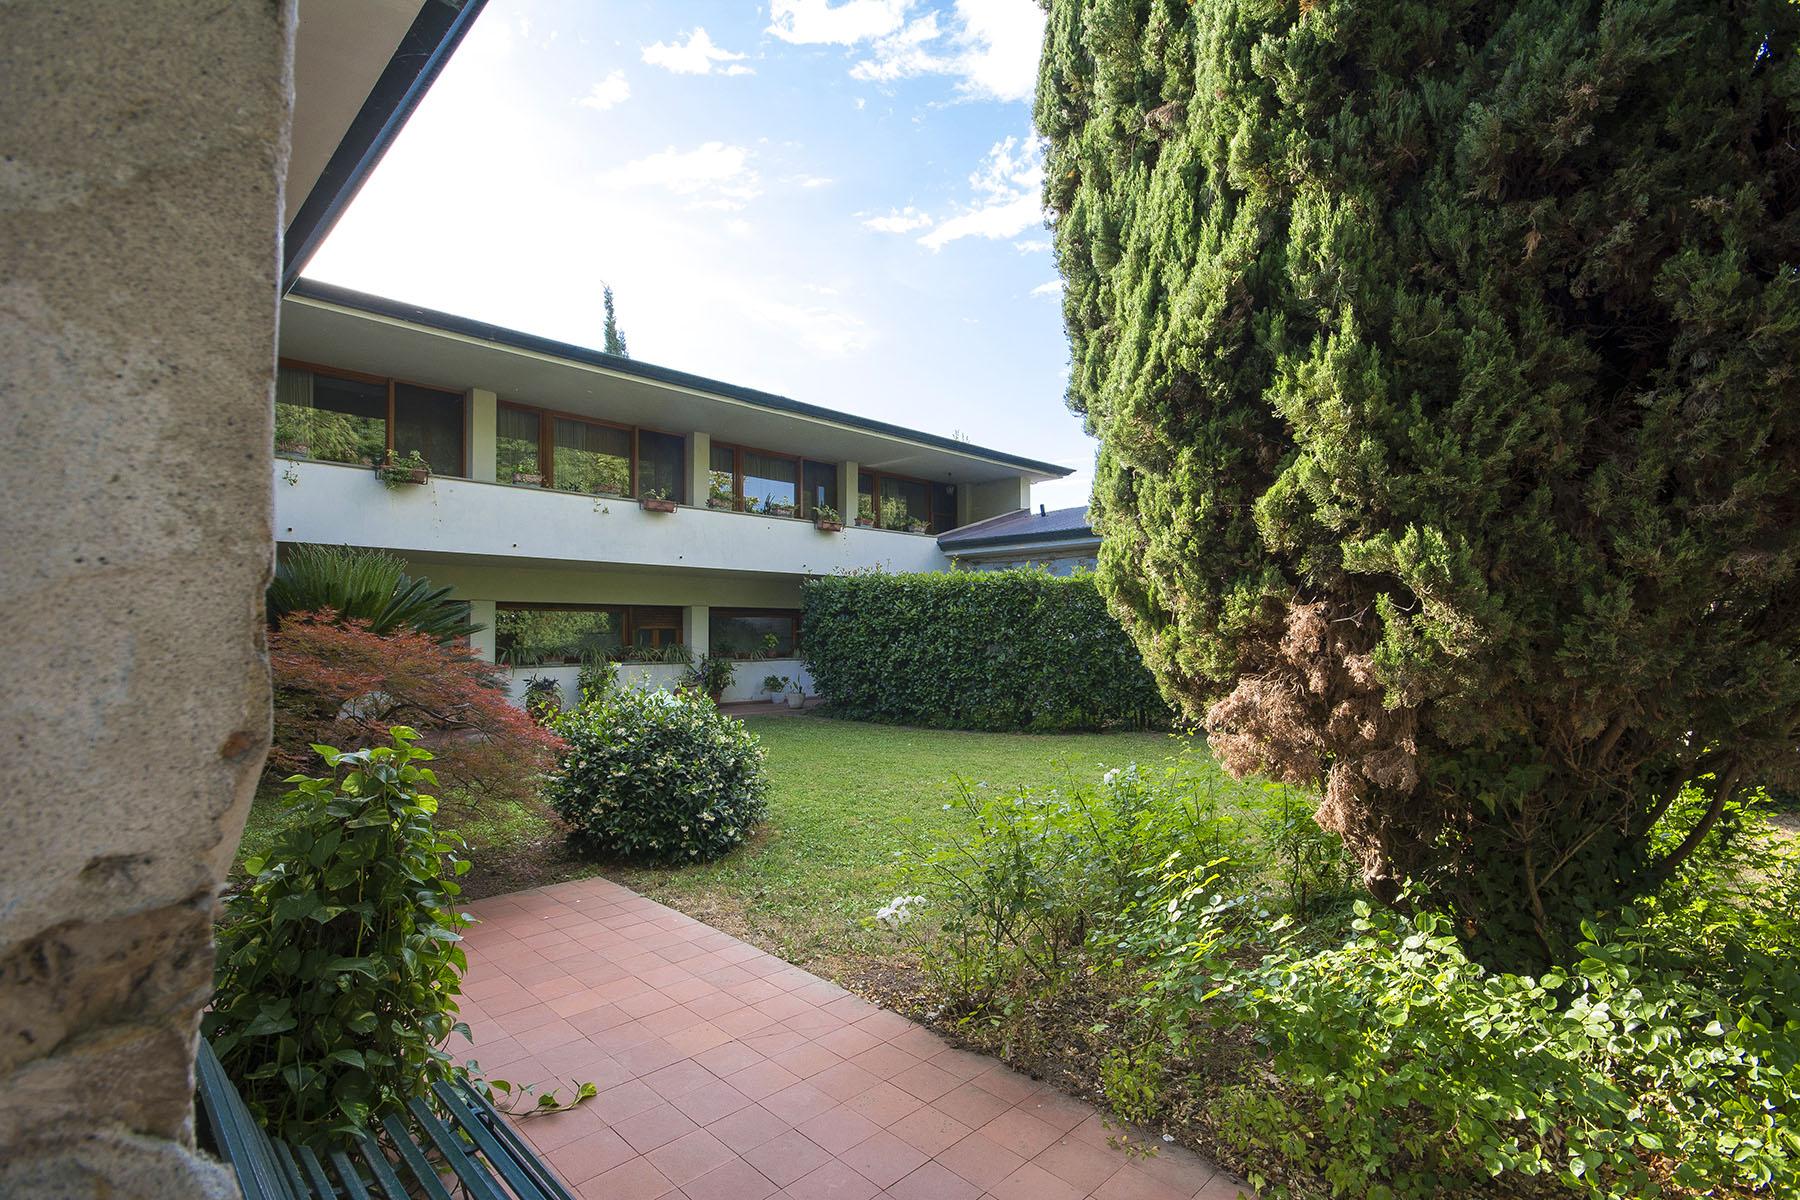 Villa in Vendita a Capannori: 5 locali, 500 mq - Foto 16